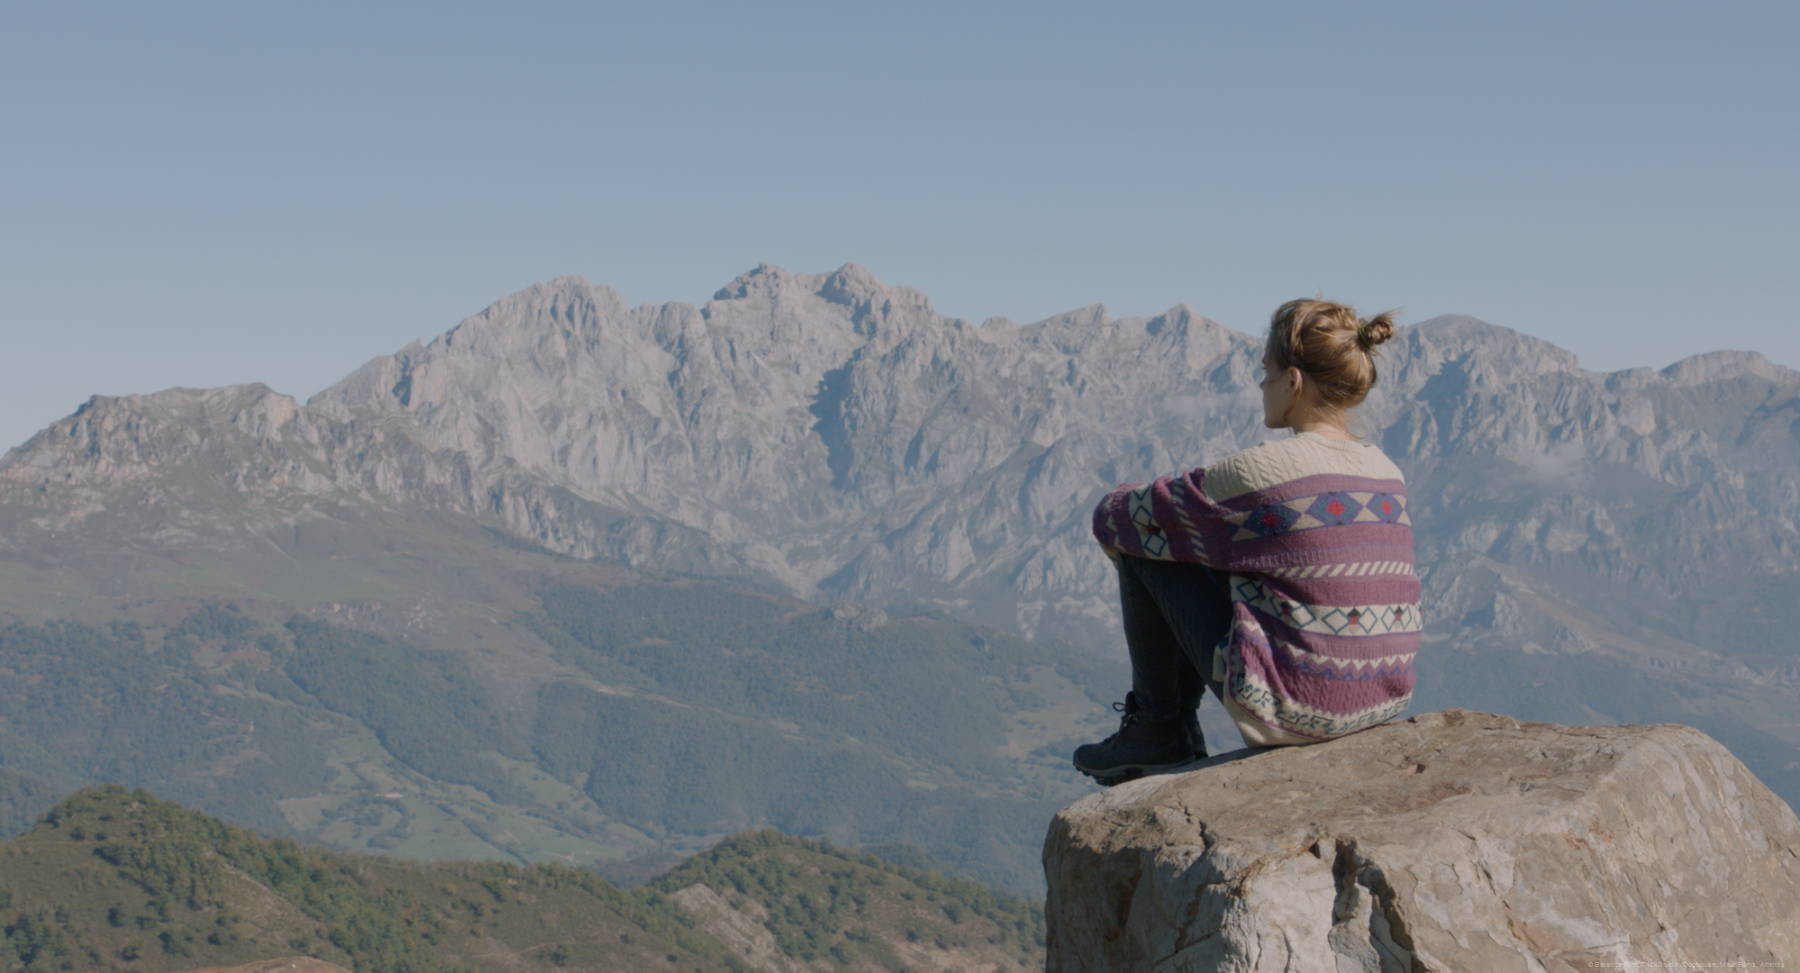 jule-assise-rocher-face-montagne